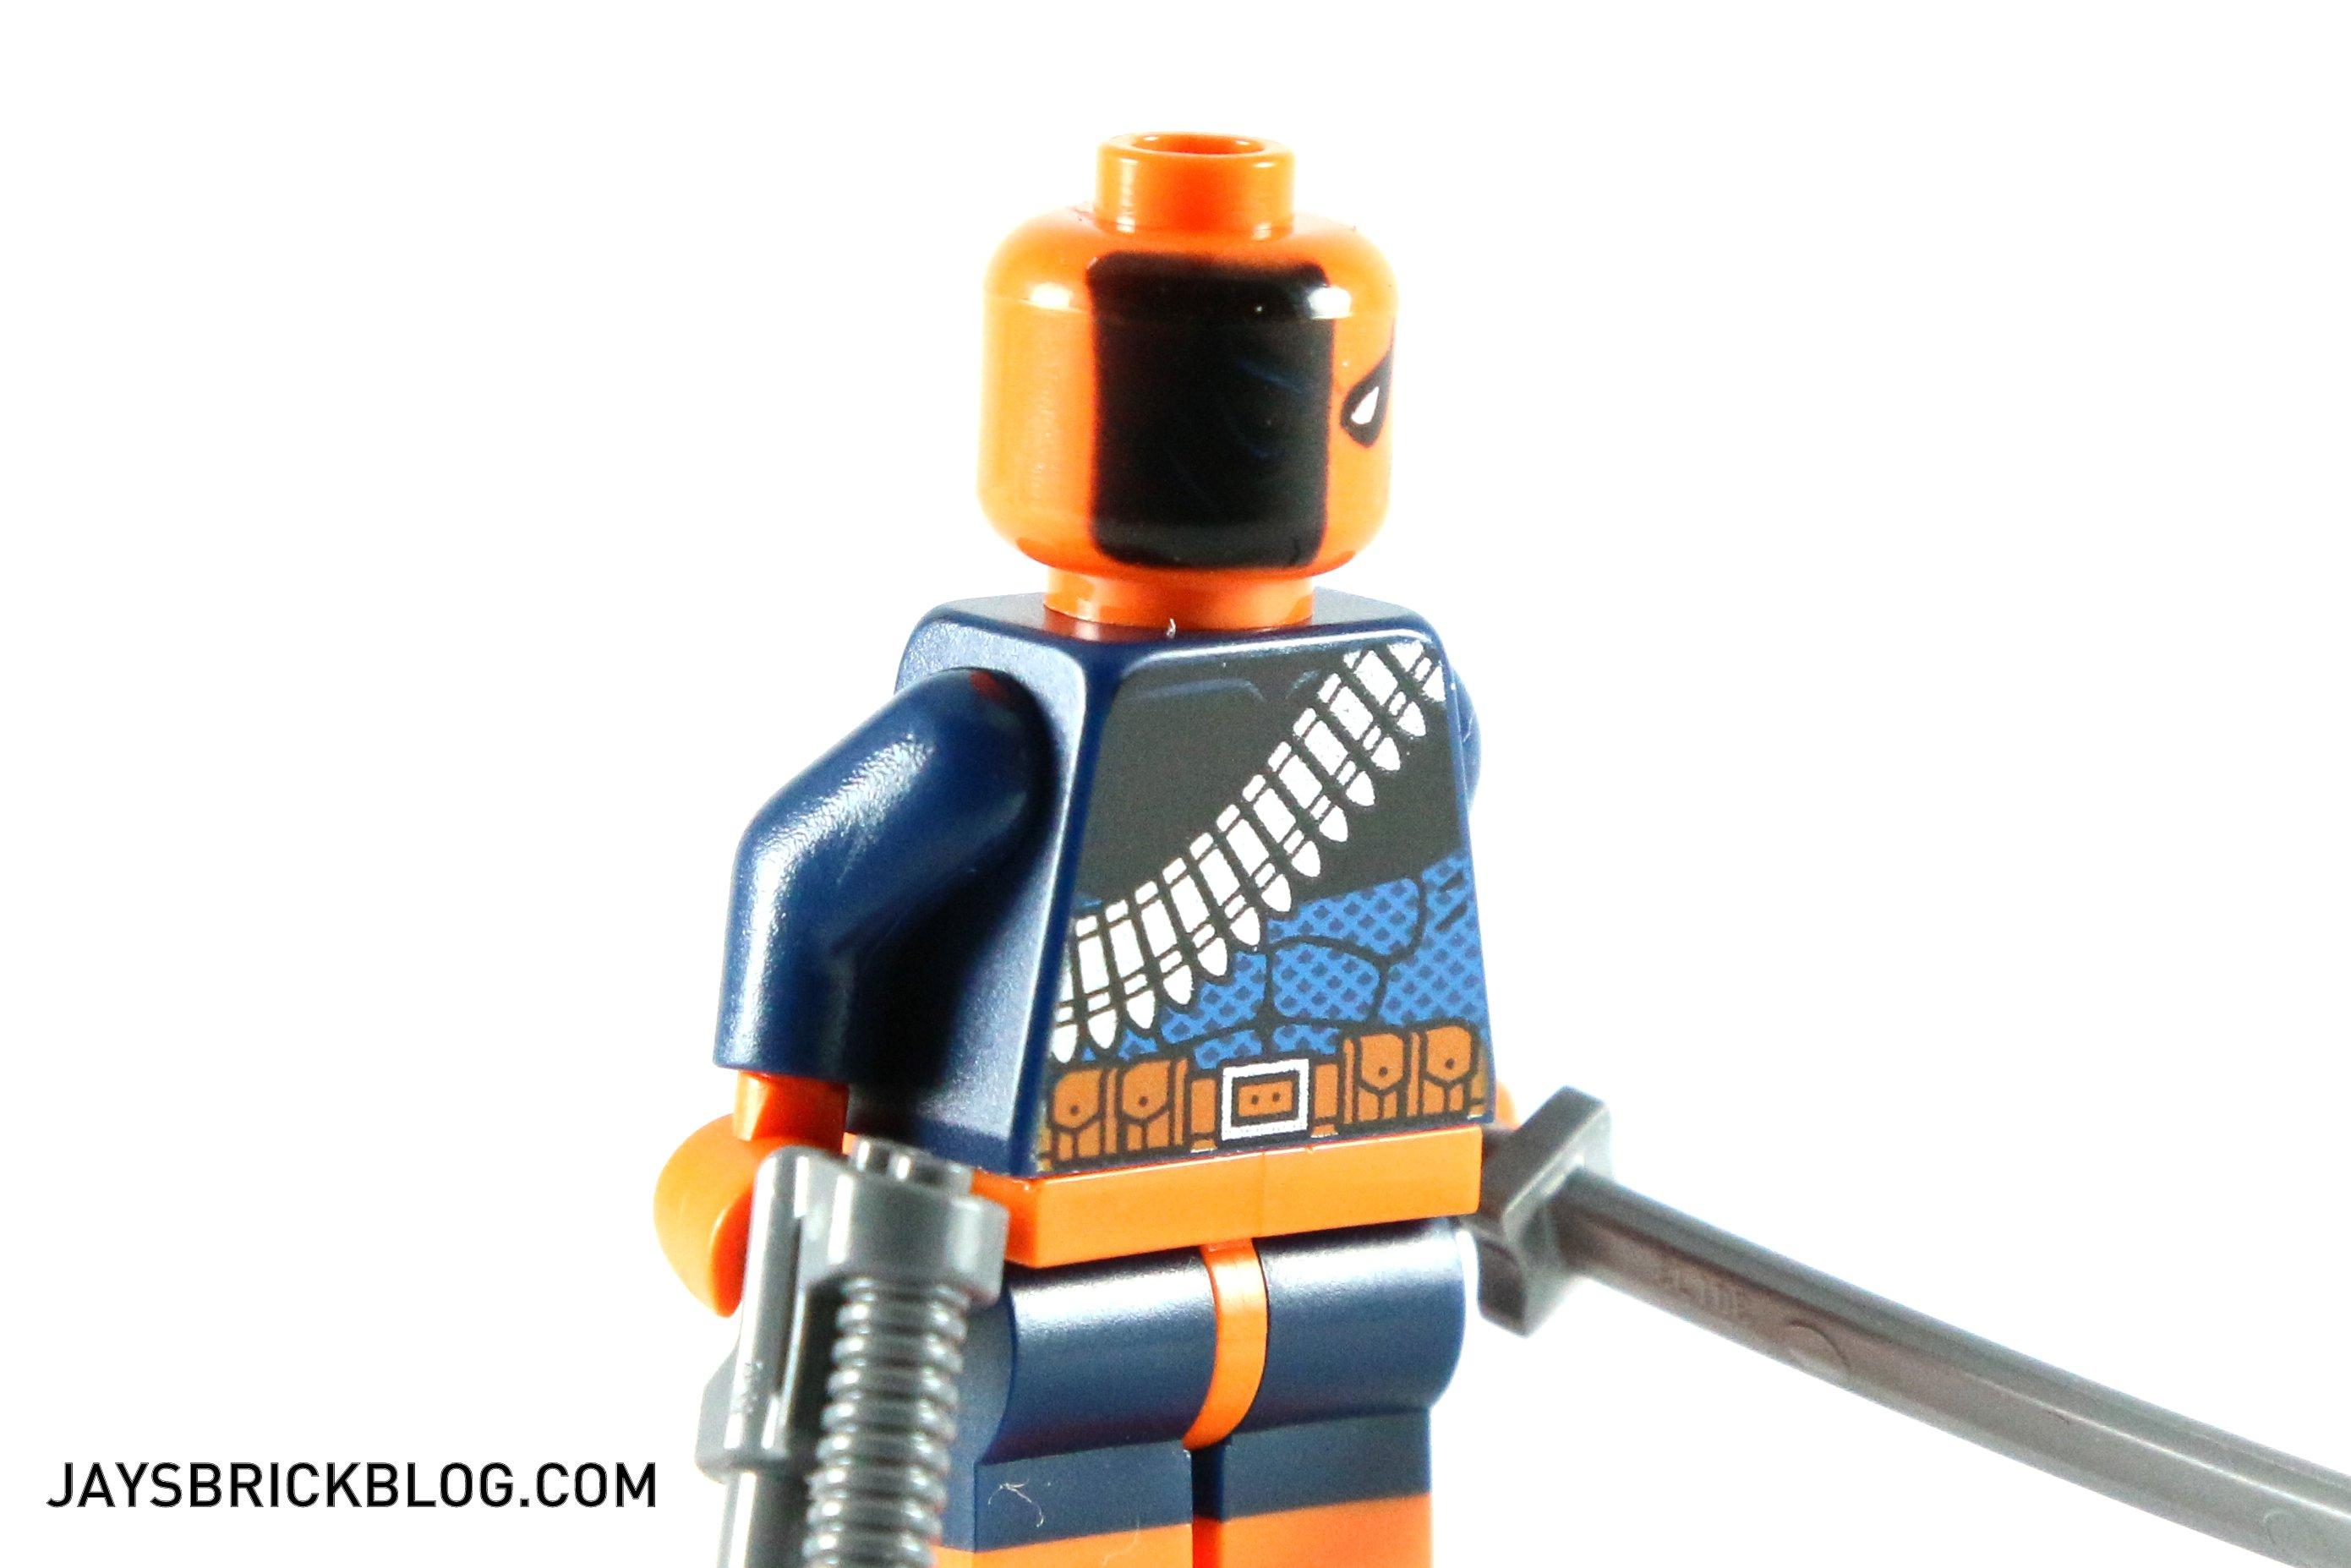 deathstroke lego - photo #31